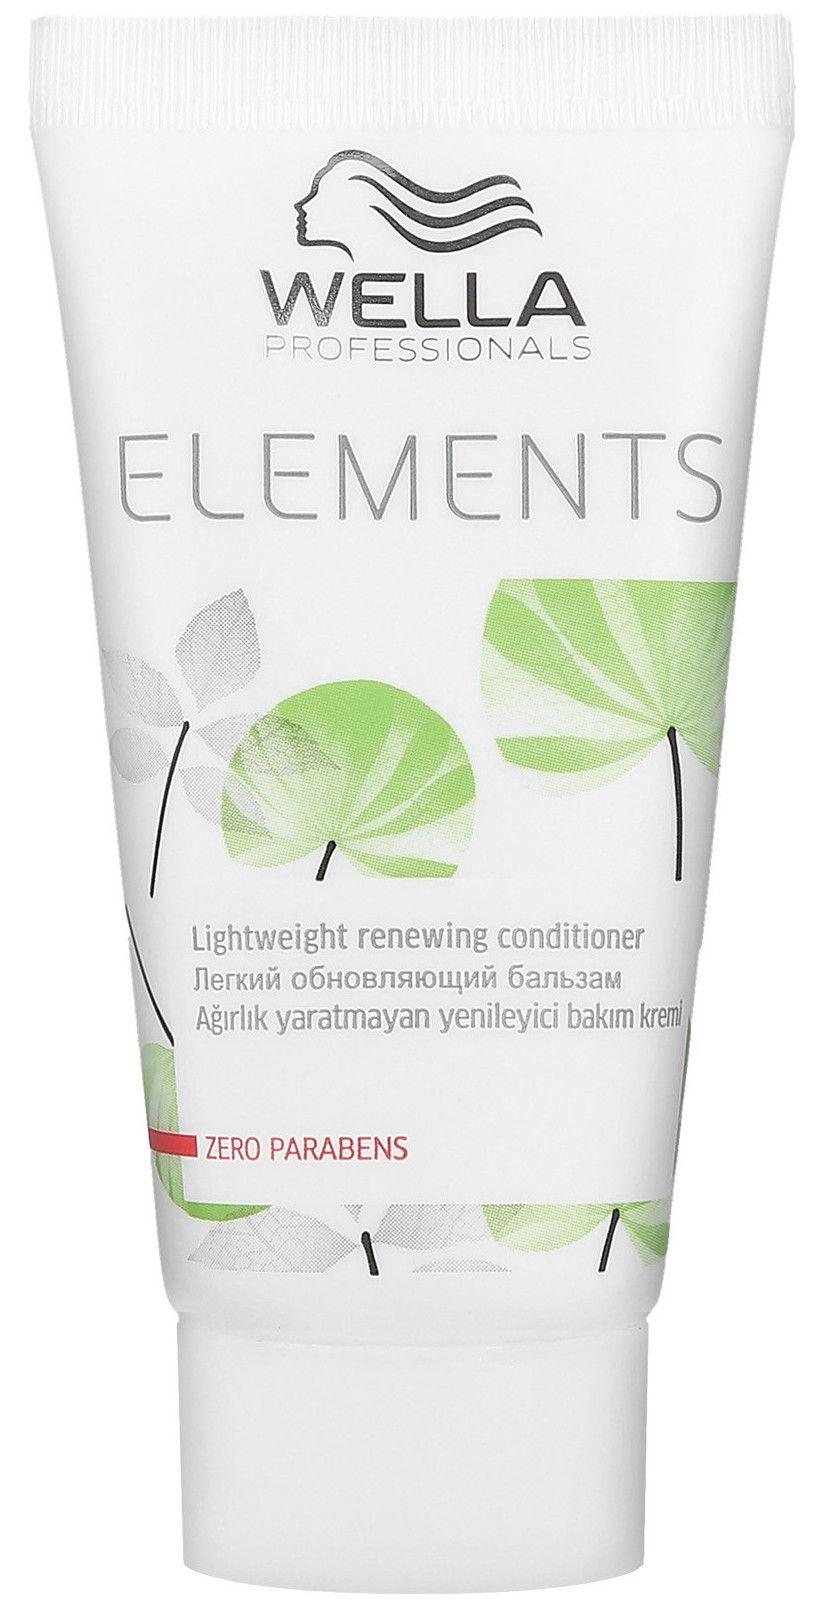 Wella Elements Renewing Conditioner 30ml